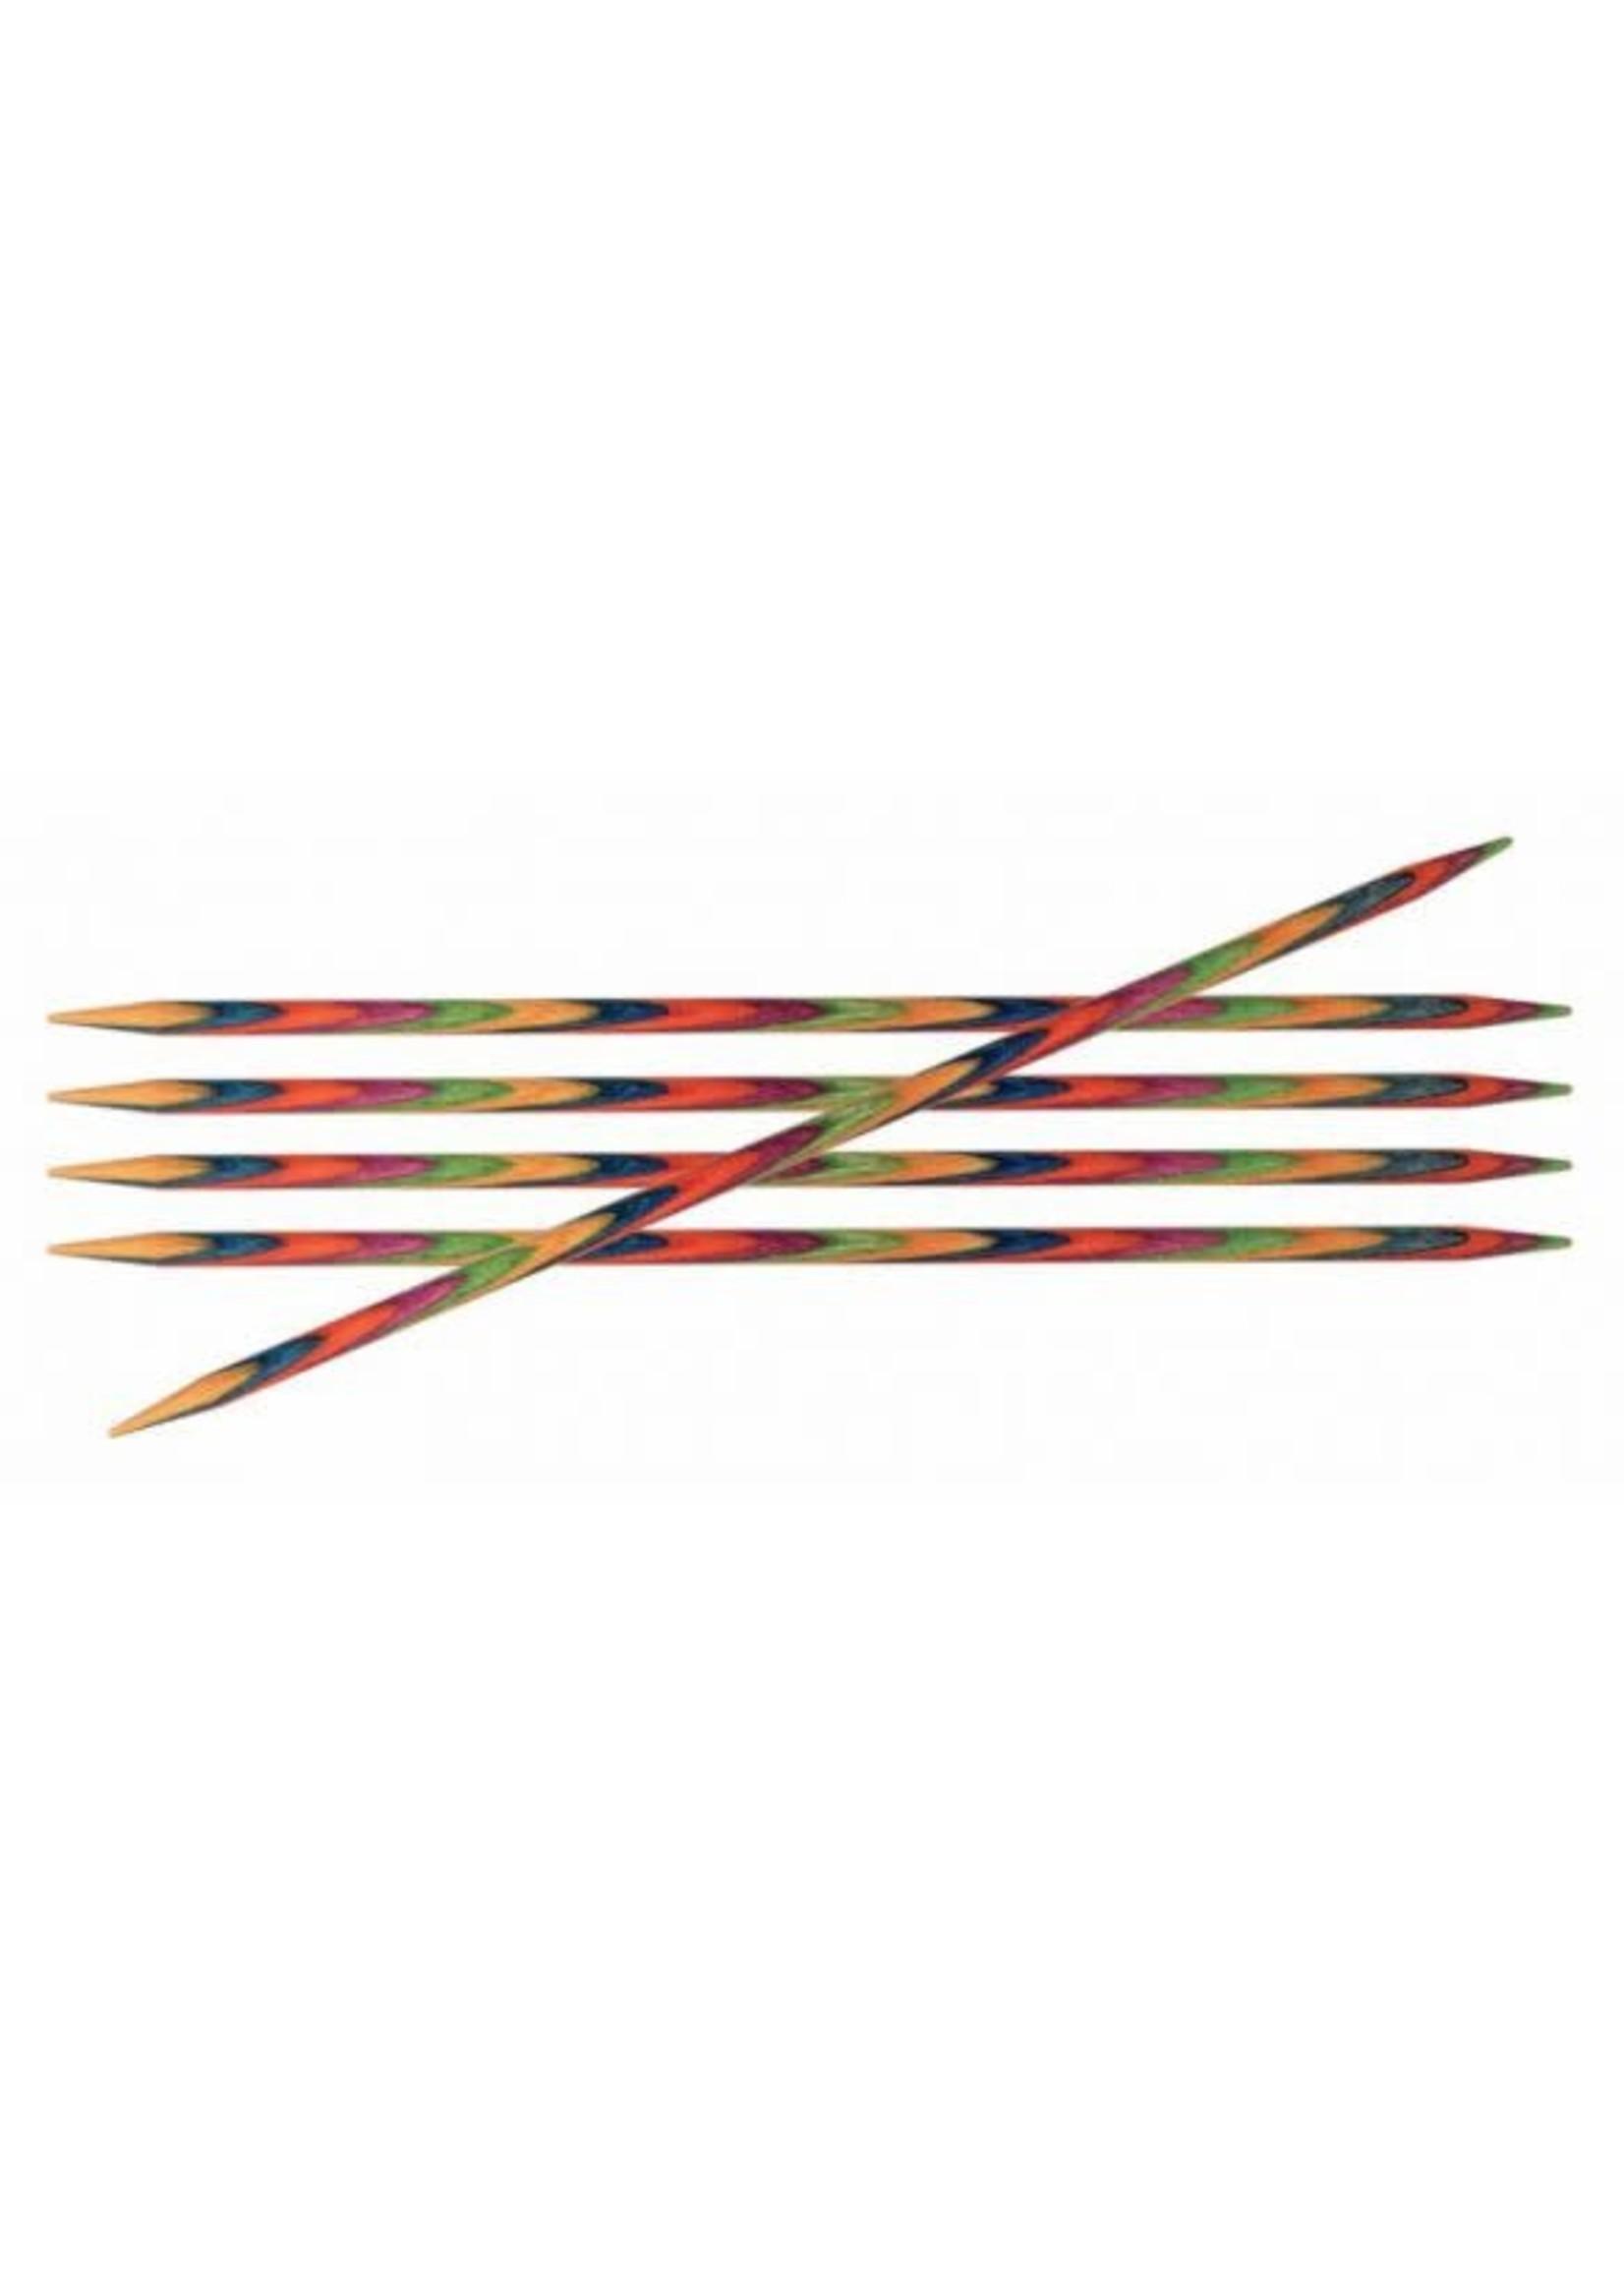 KnitPro Knitpro Symfonie Sokkennaalden 15cm - 3.00mm